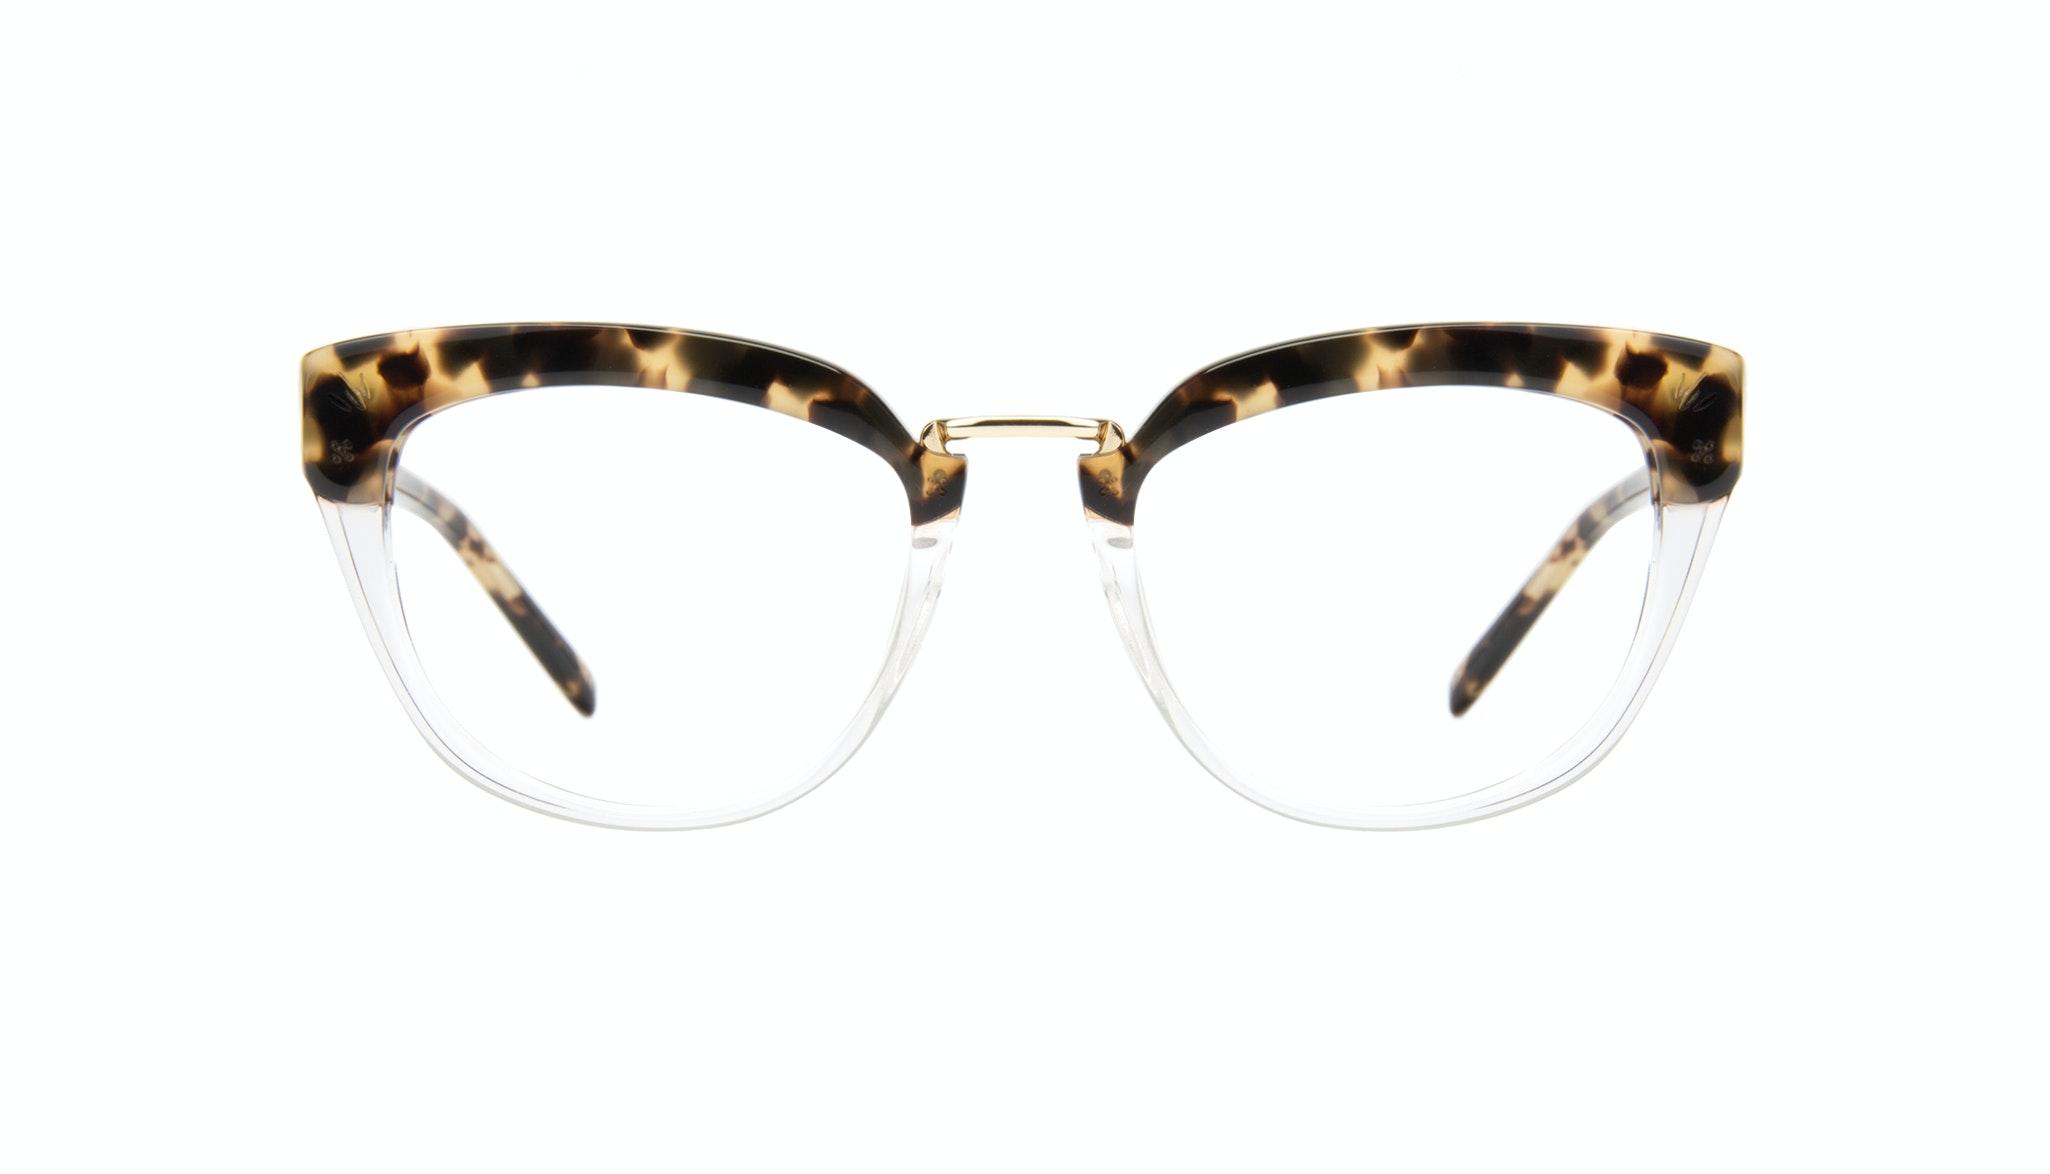 Affordable Fashion Glasses Cat Eye Daring Cateye Eyeglasses Women Pure Tortoise Front